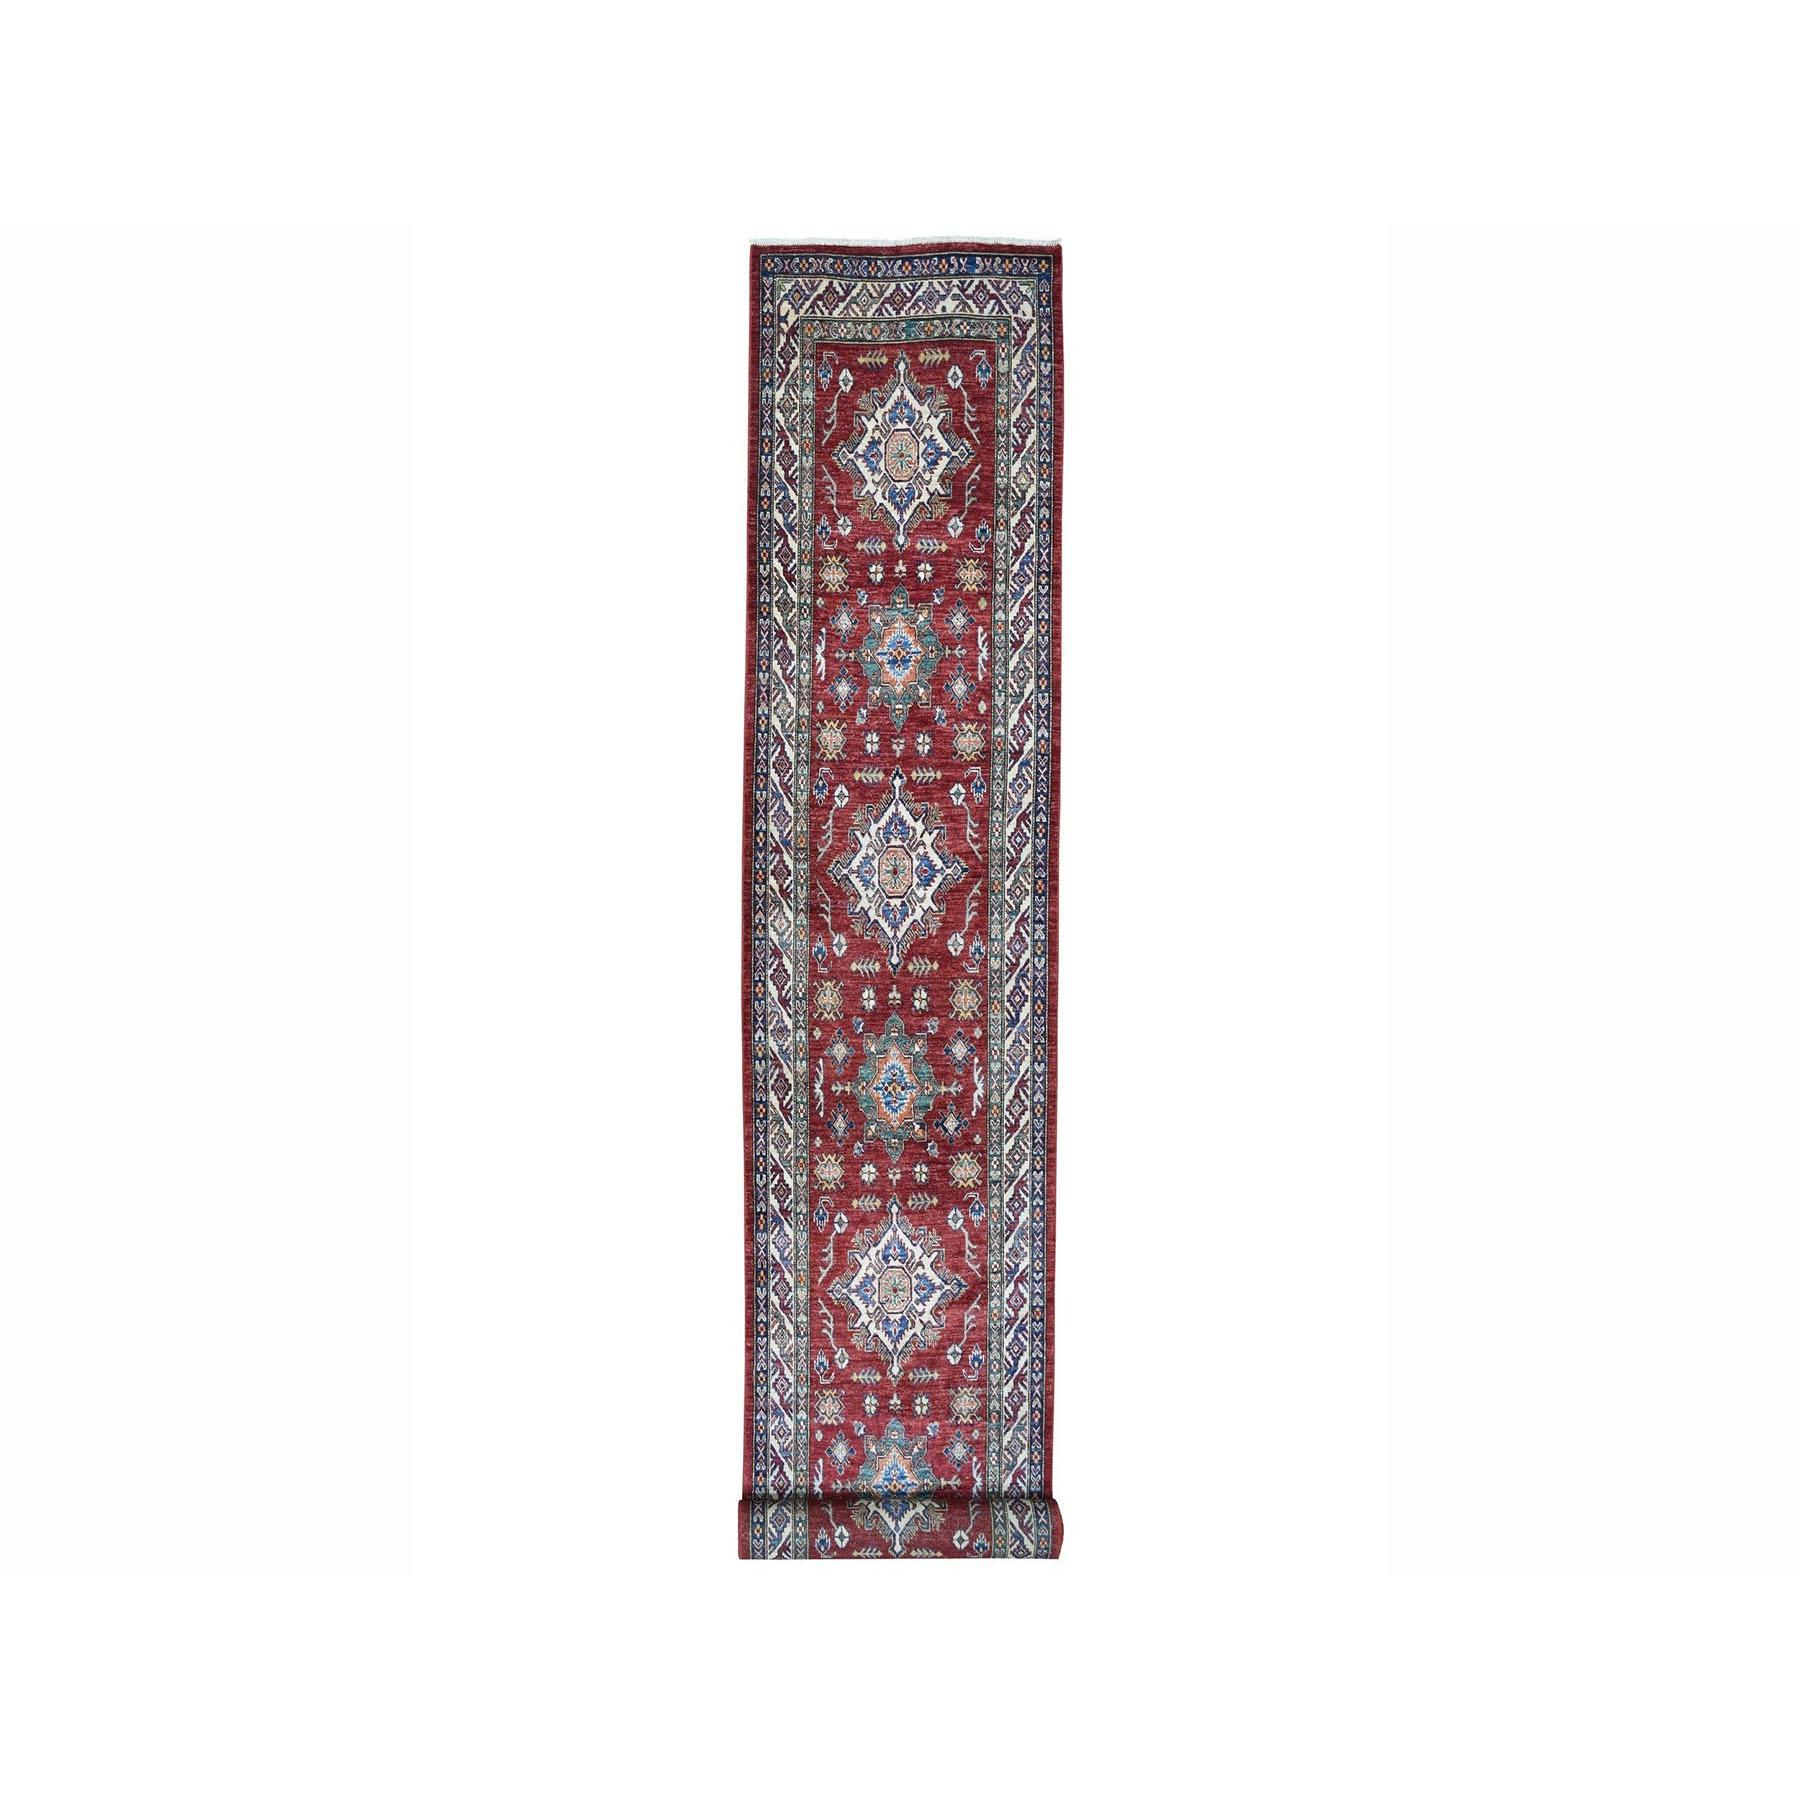 "3'3""X18'7"" Super Kazak Red Geometric Design Pure Wool Hand-Knotted Xl Runner Oriental Rug moae006c"